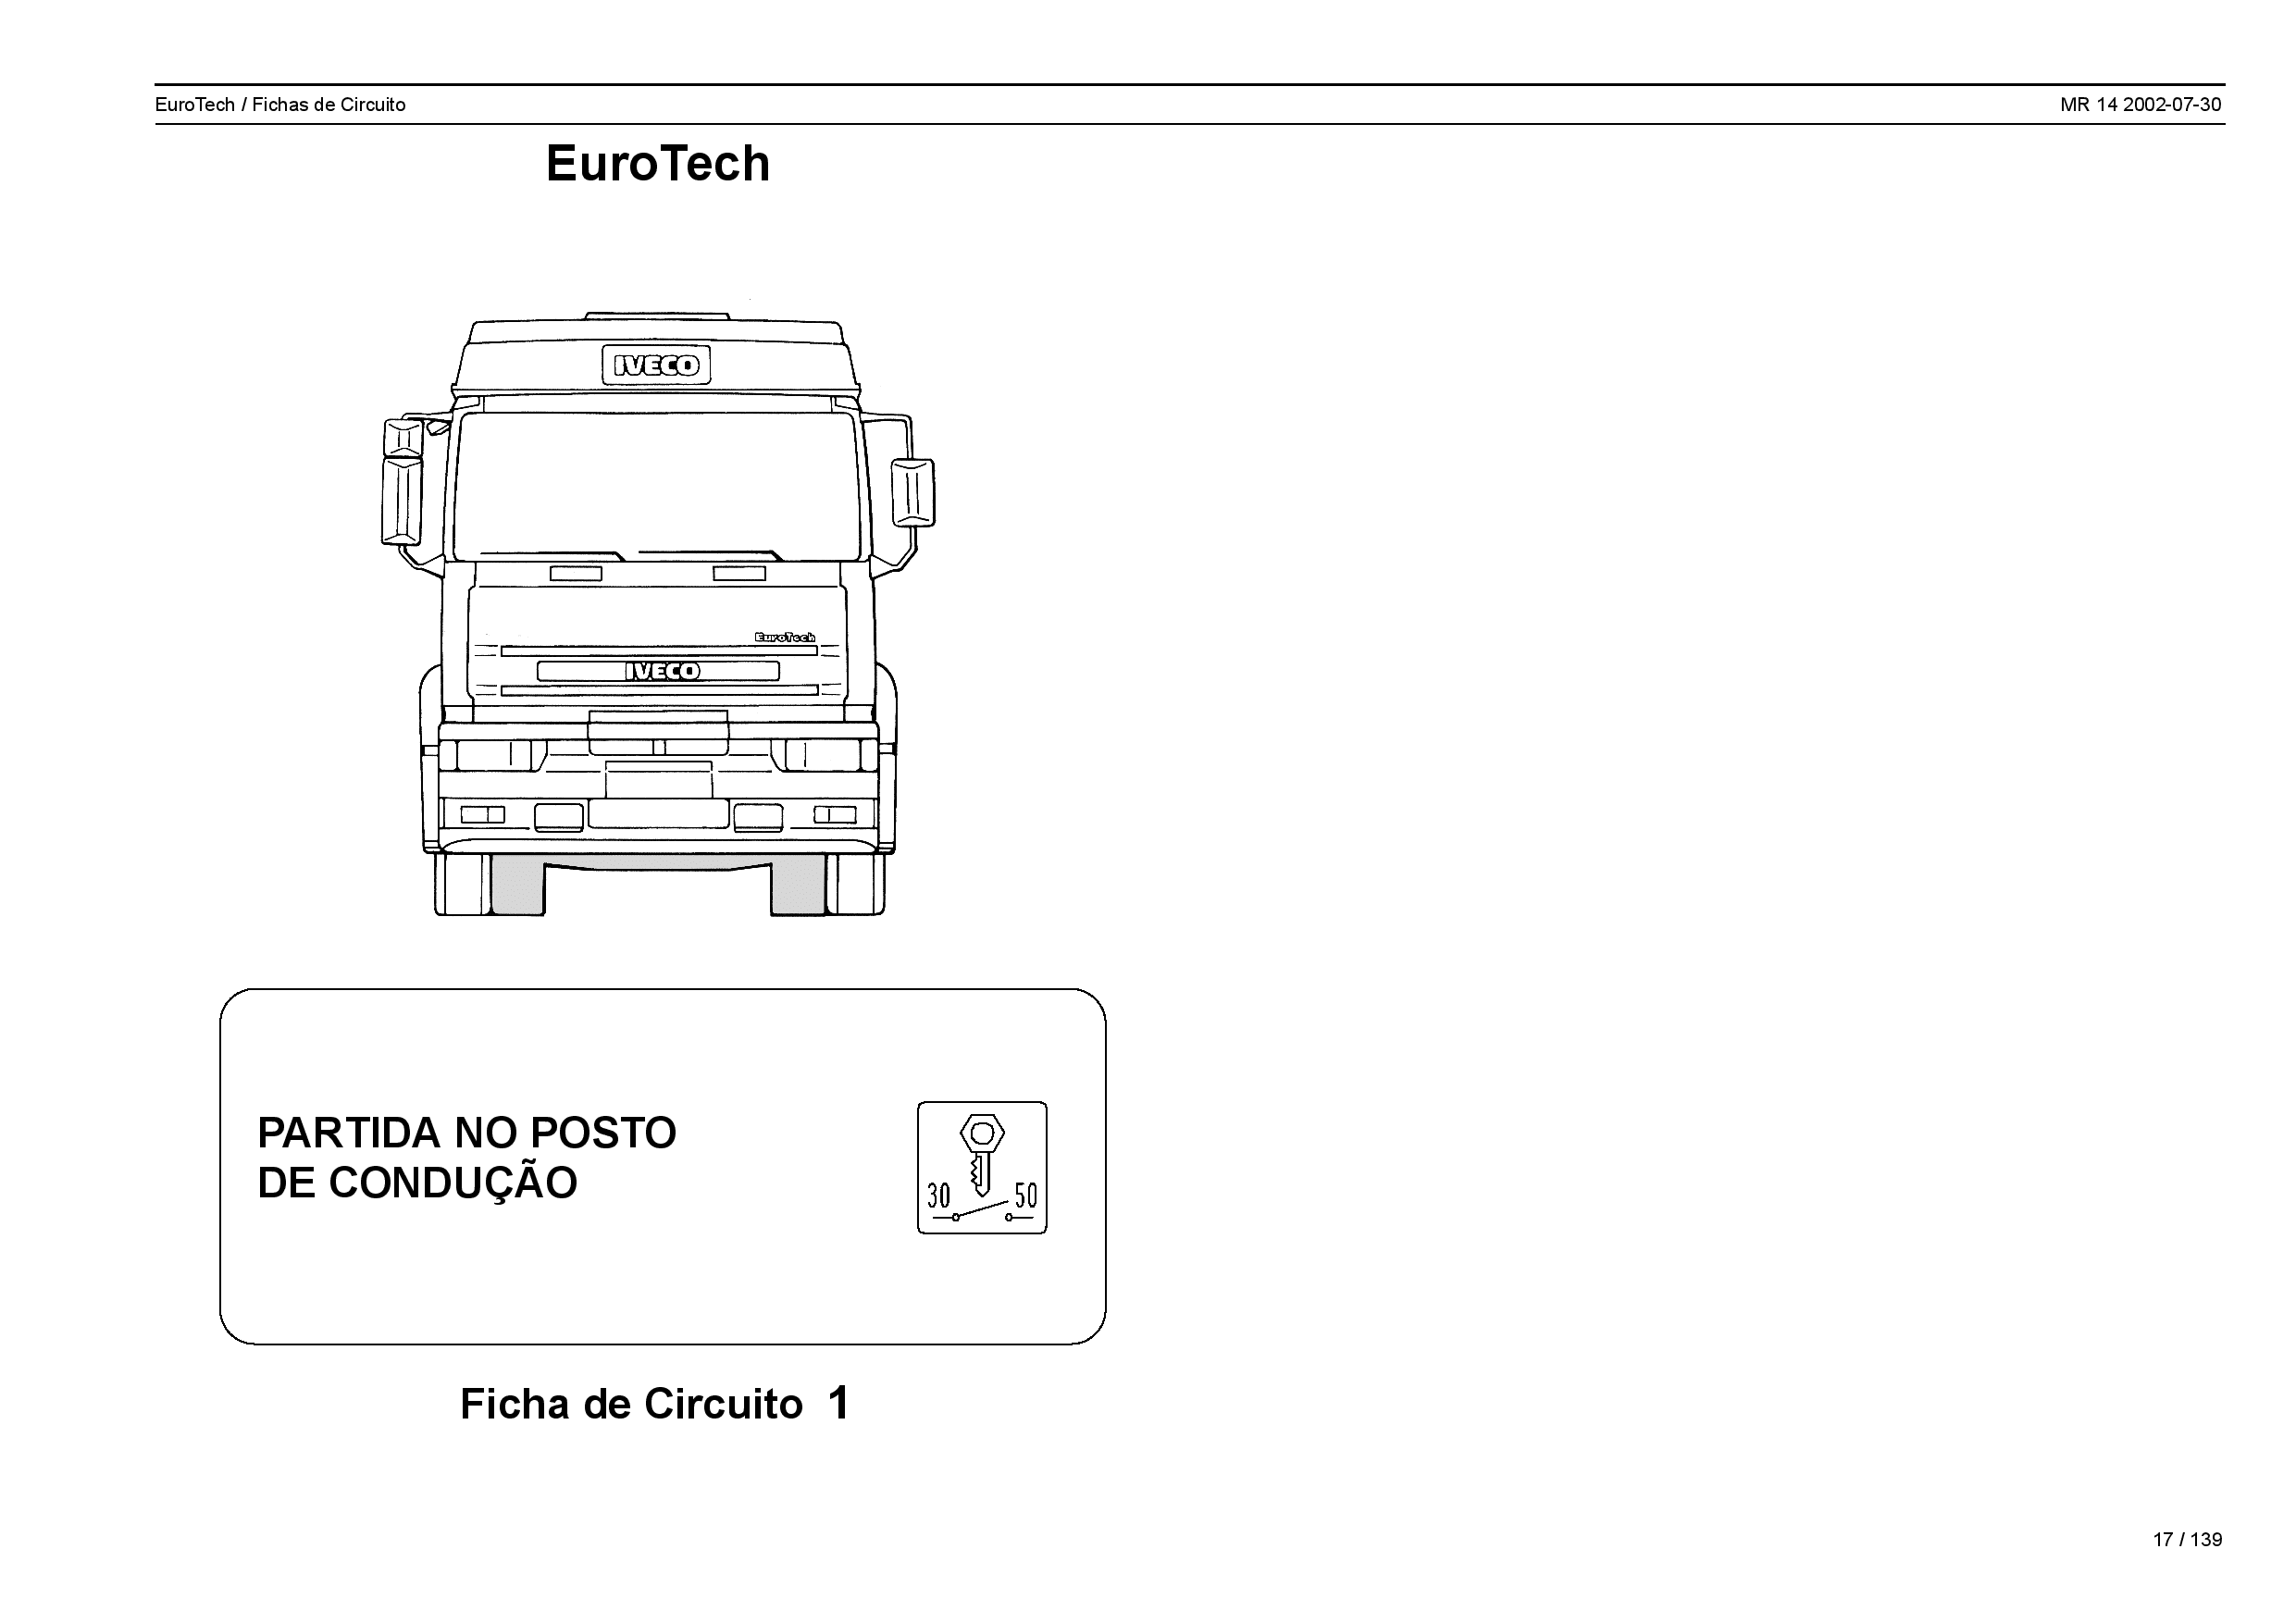 Iveco MR 14 EuroTech Fichas de Circuito Portuguese Manual